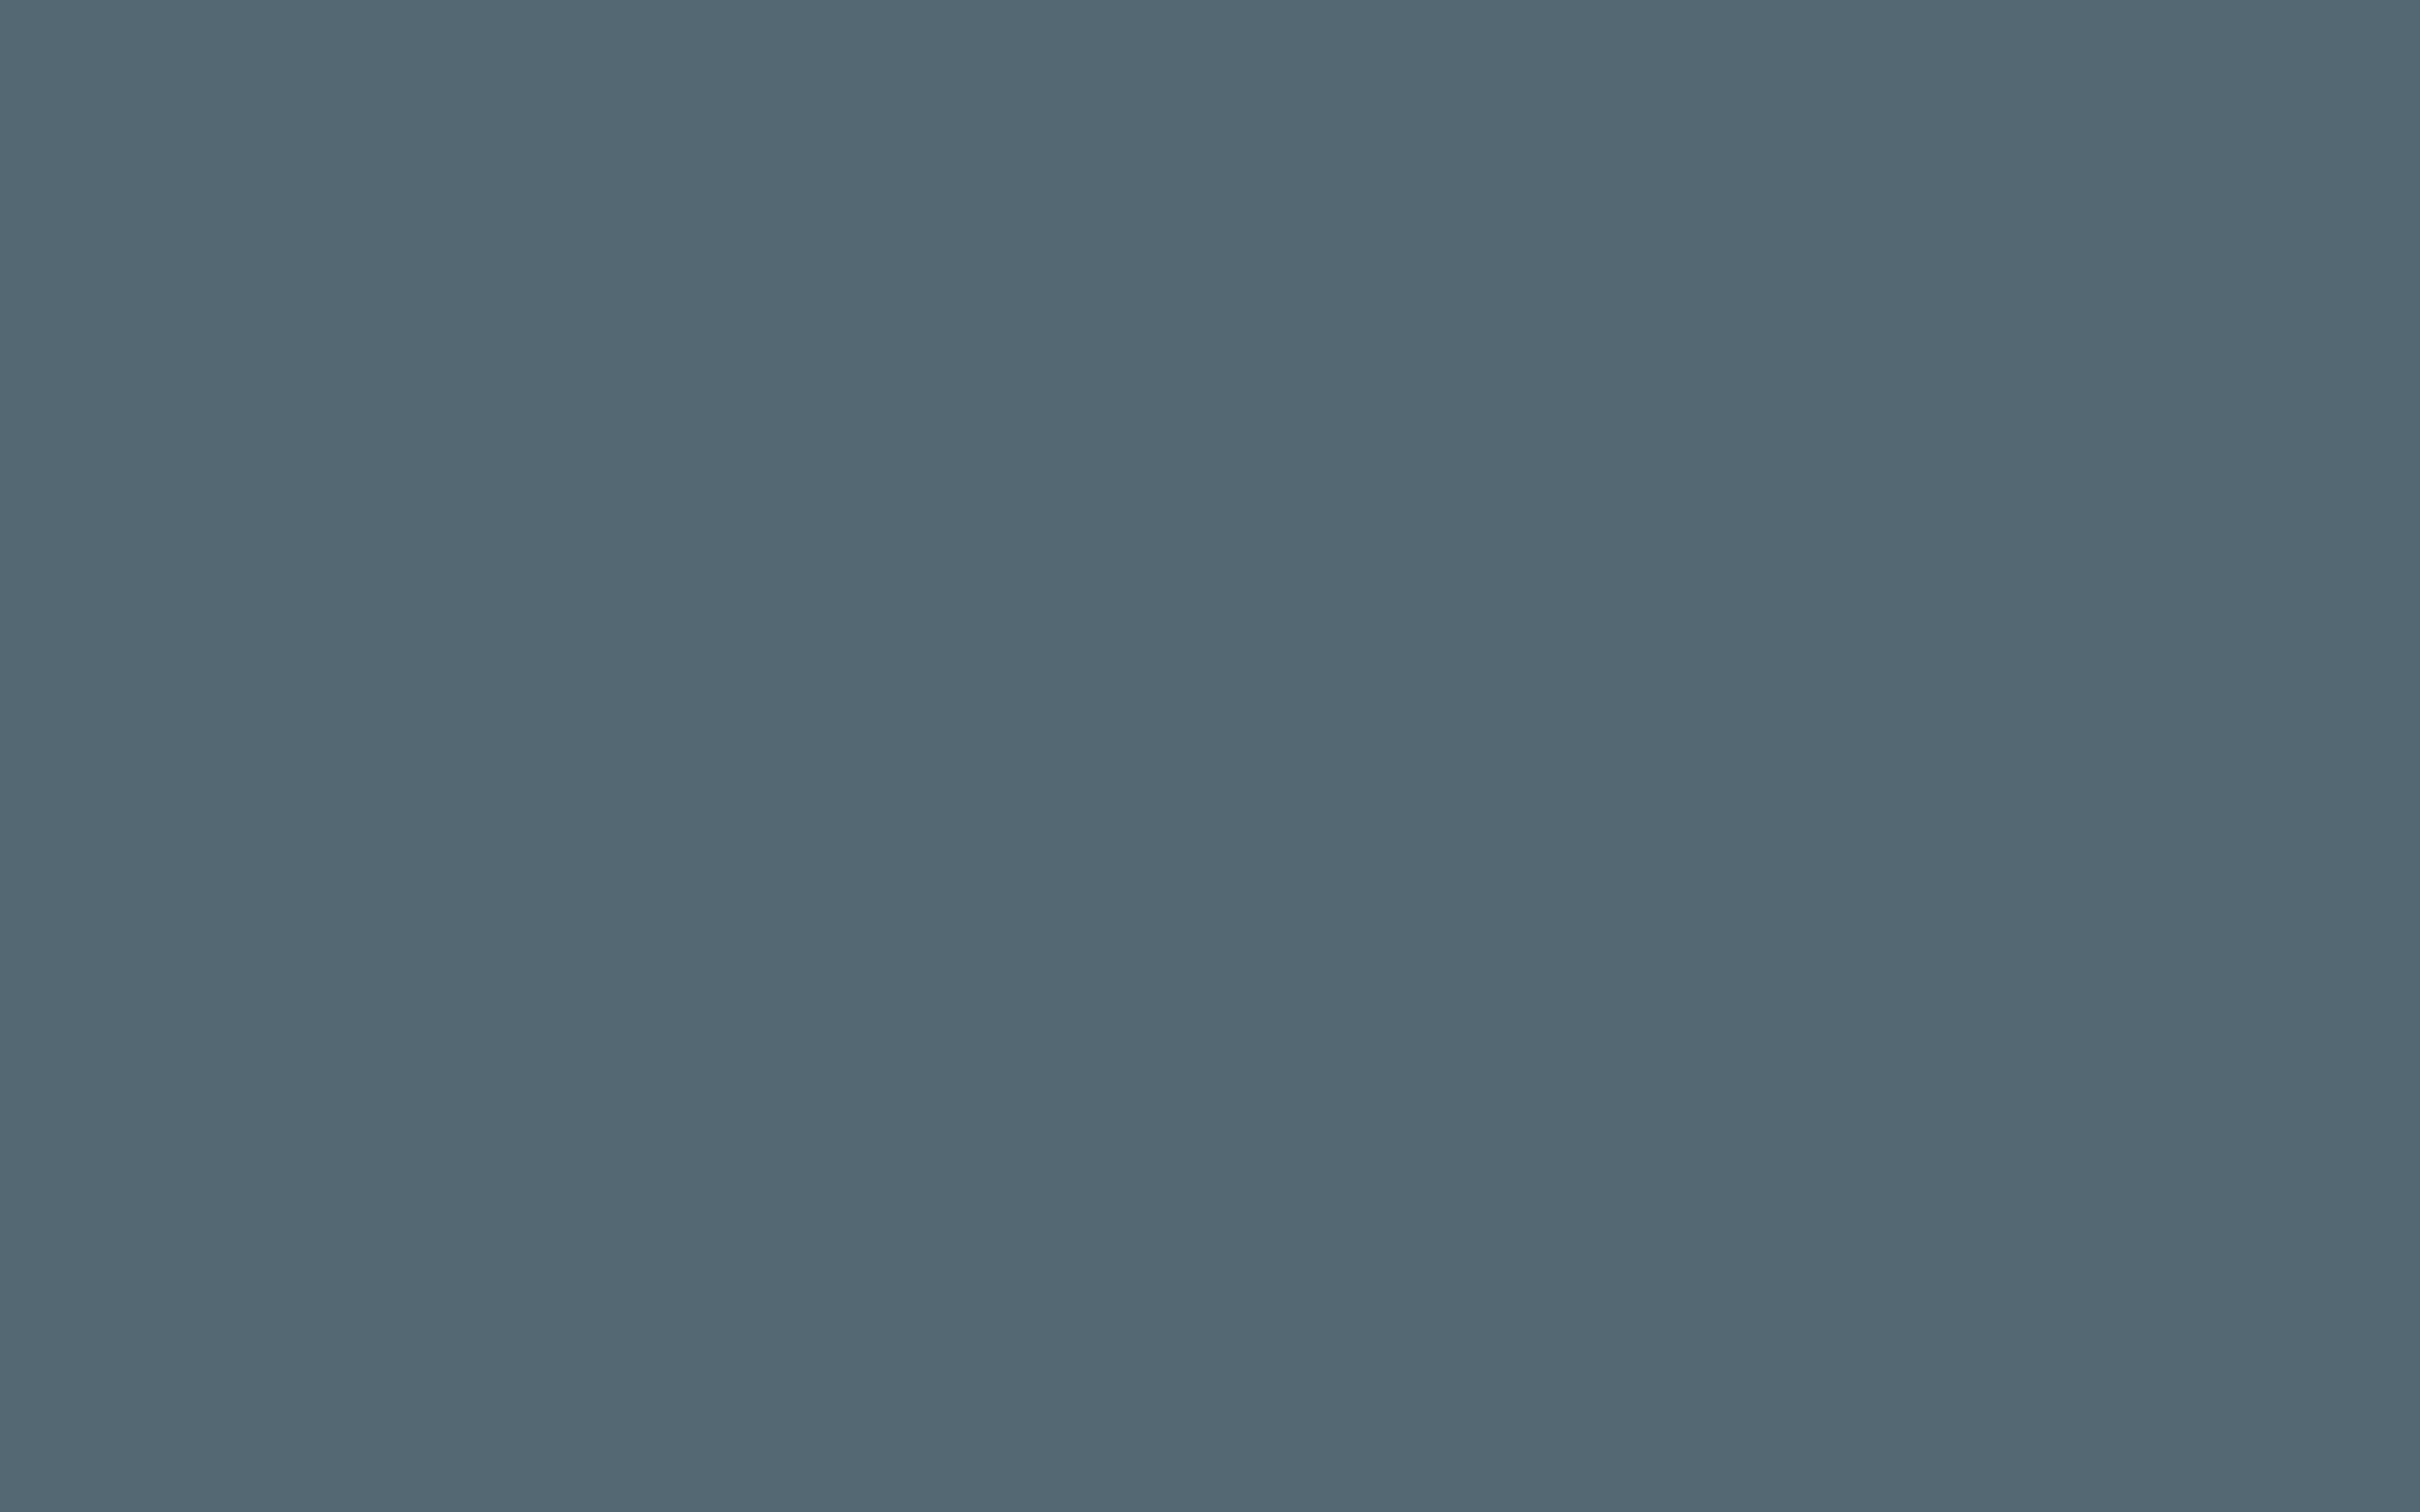 2560x1600 Cadet Solid Color Background